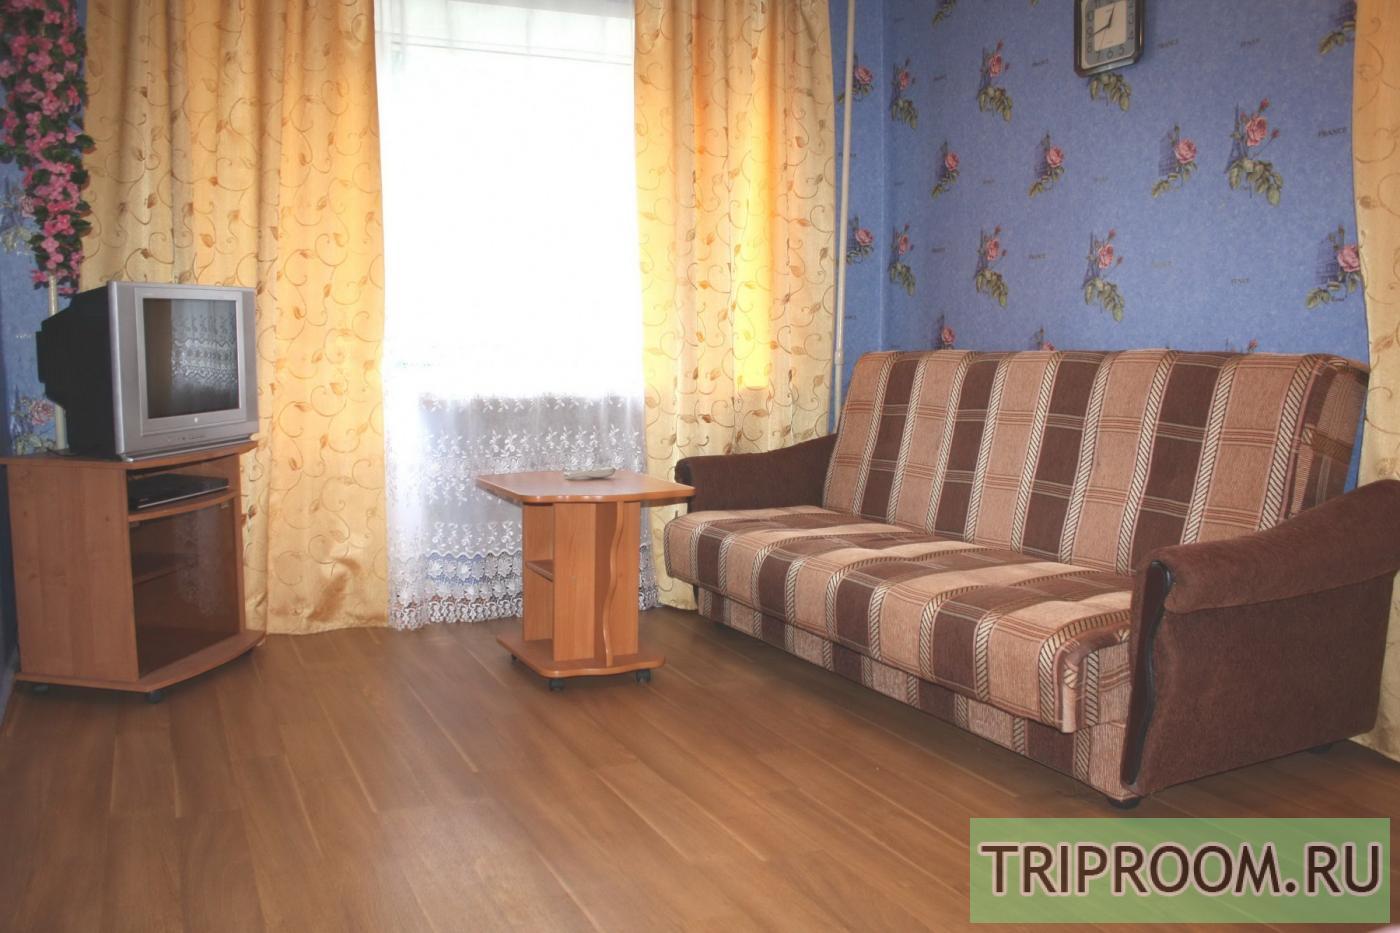 1-комнатная квартира посуточно (вариант № 21779), ул. Красная улица, фото № 1